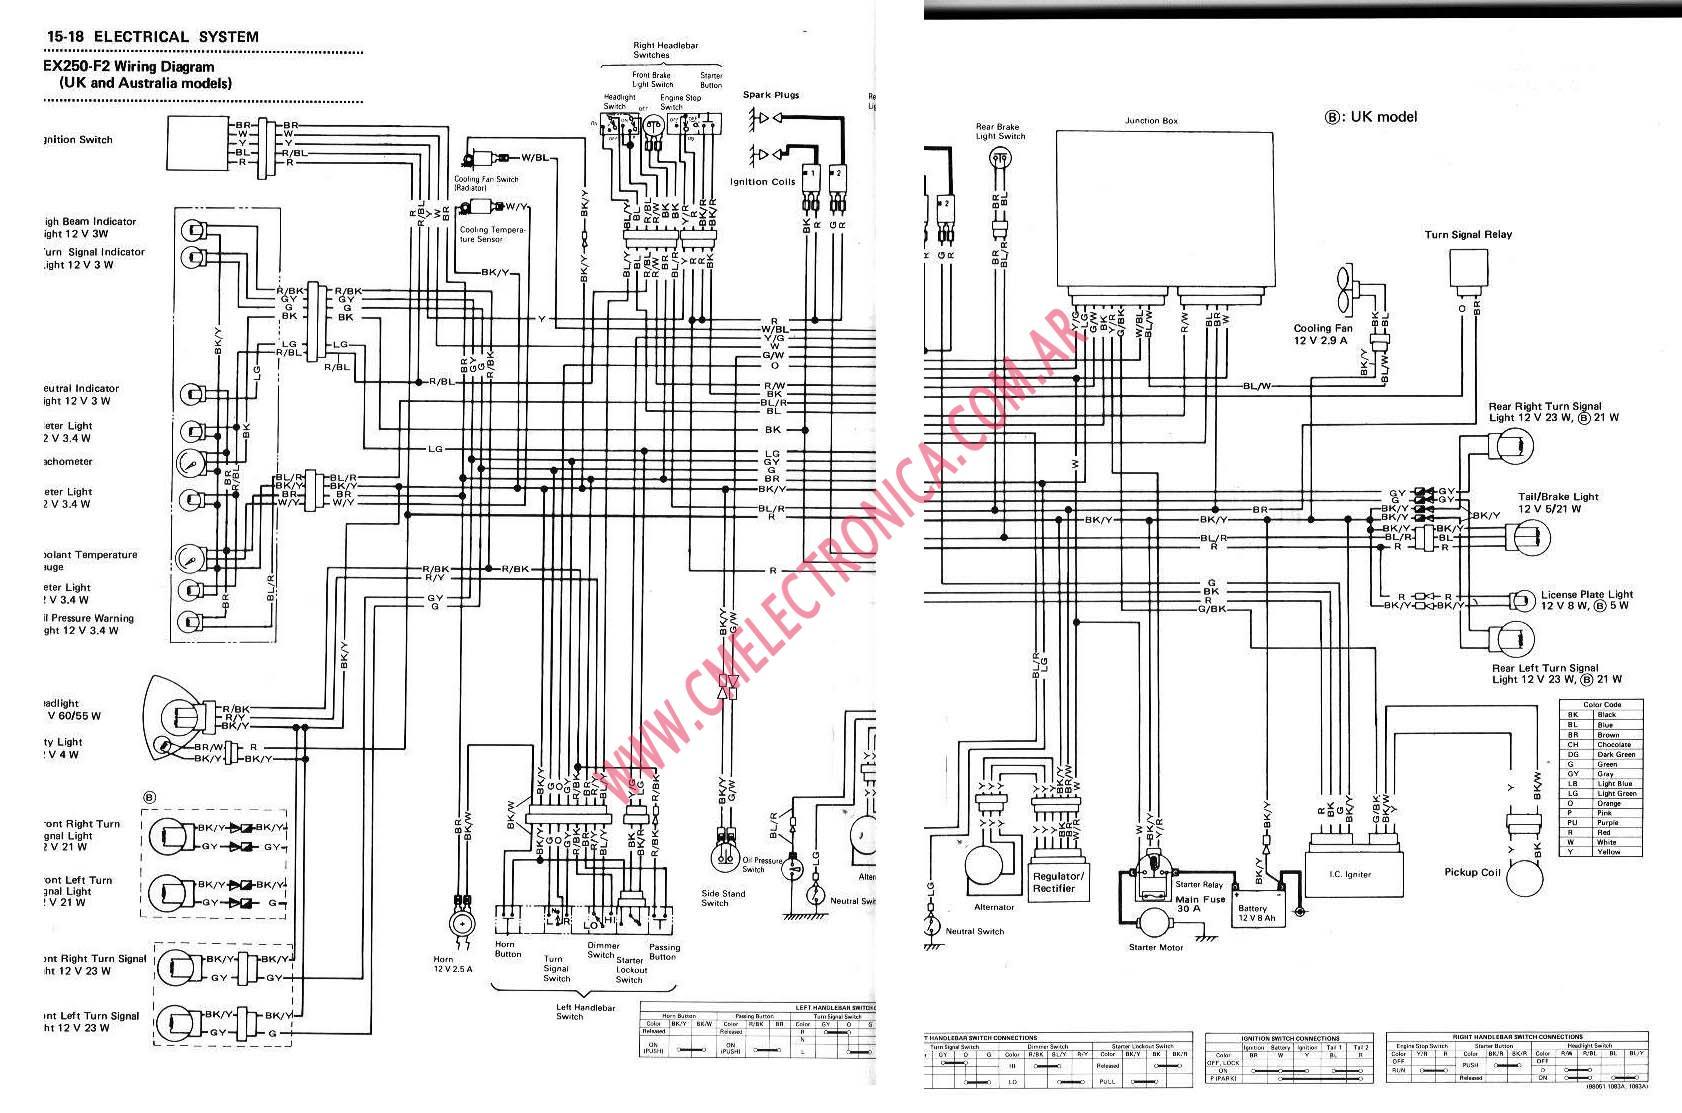 Wiring Diagram Whirlpool Washing Machine Lsq911 47 Somfy Motor Boat Diagrams Free Download Car Electric Start Generator Schematic Voltmeter Symbol